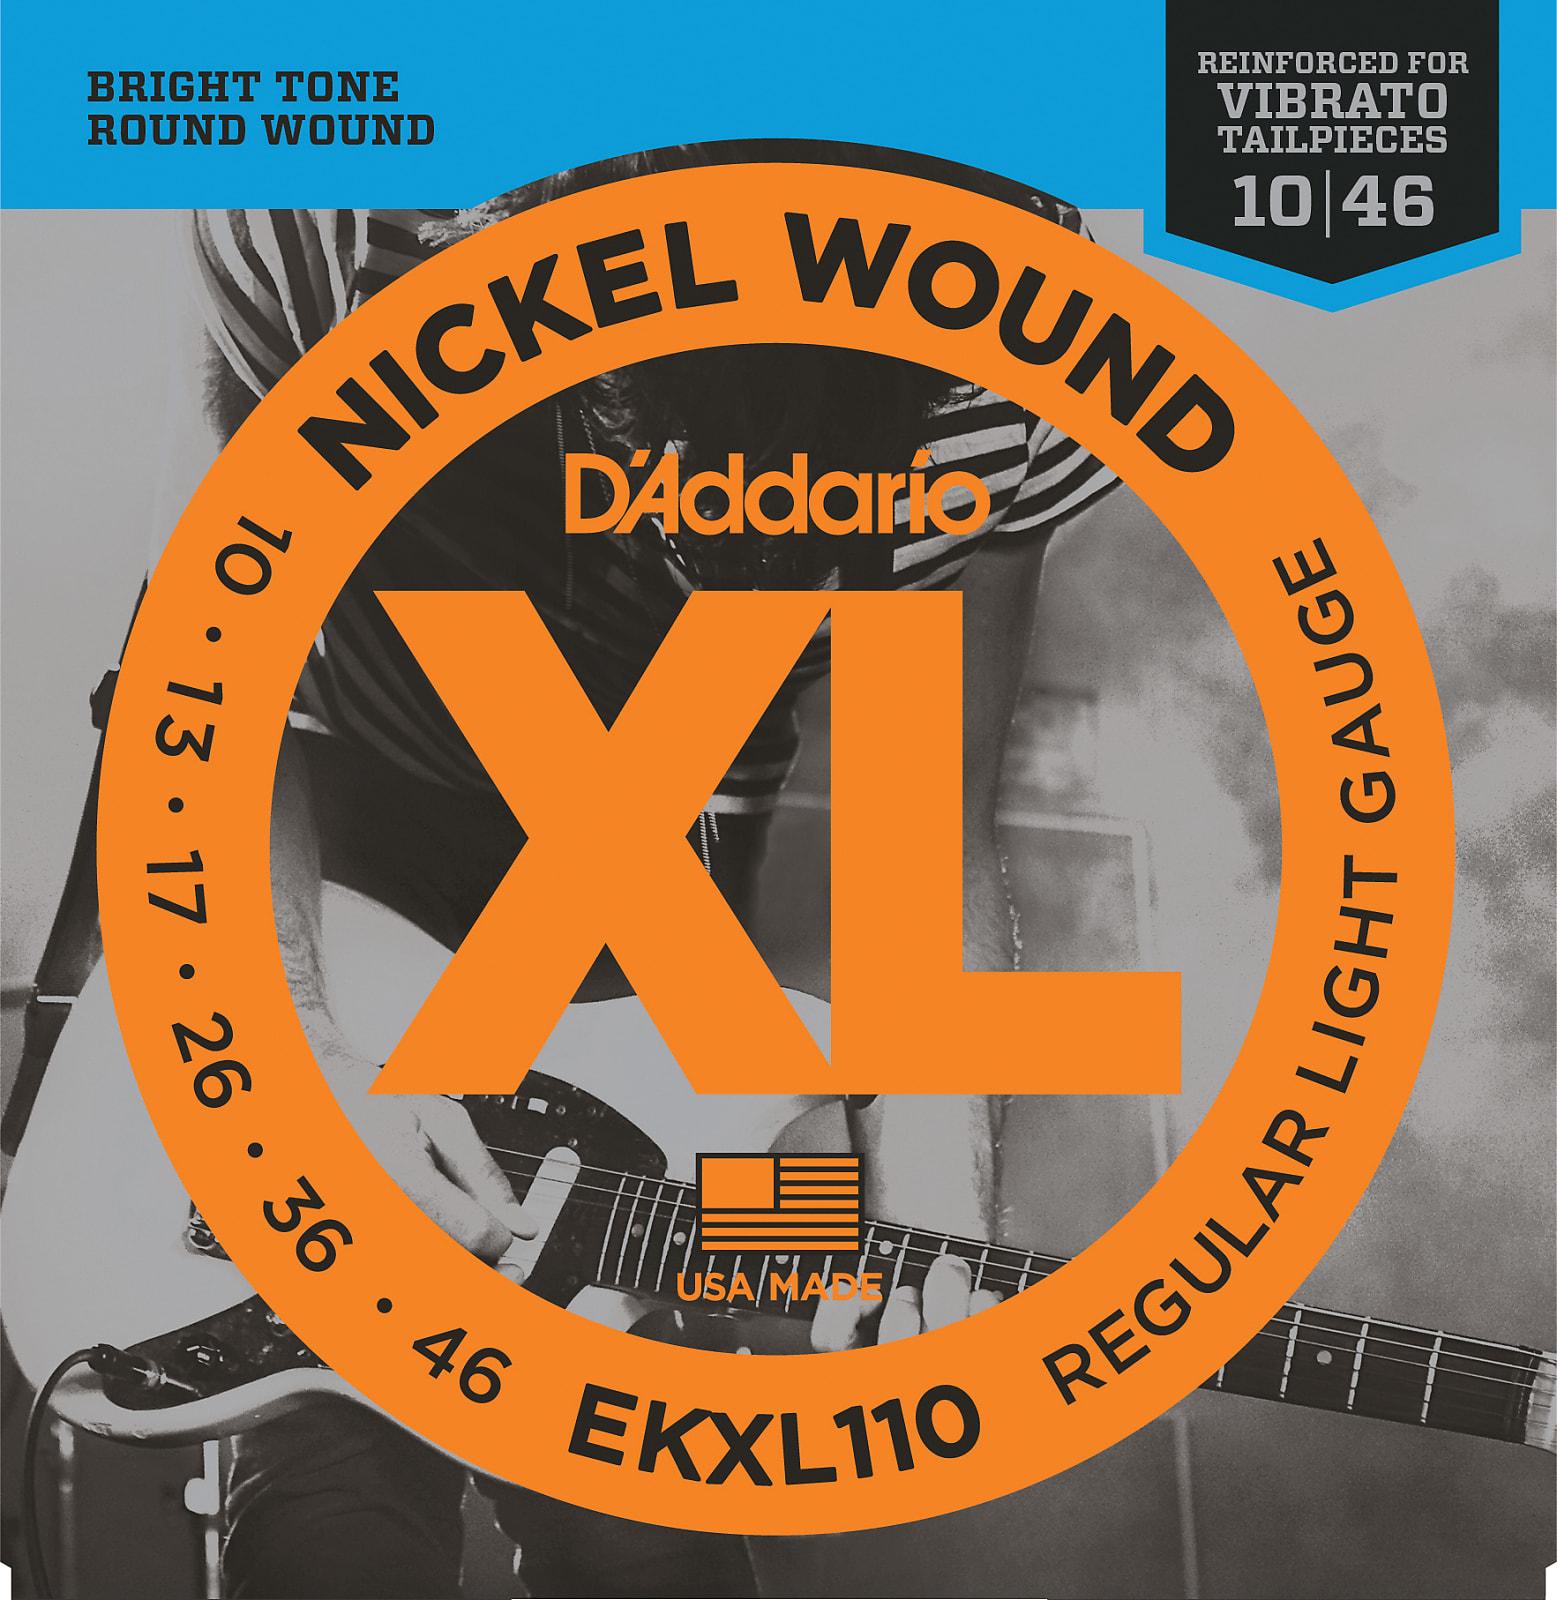 D'Addario EKXL110 Nickel Wound Electric Guitar Strings, Regular Light, Reinforc